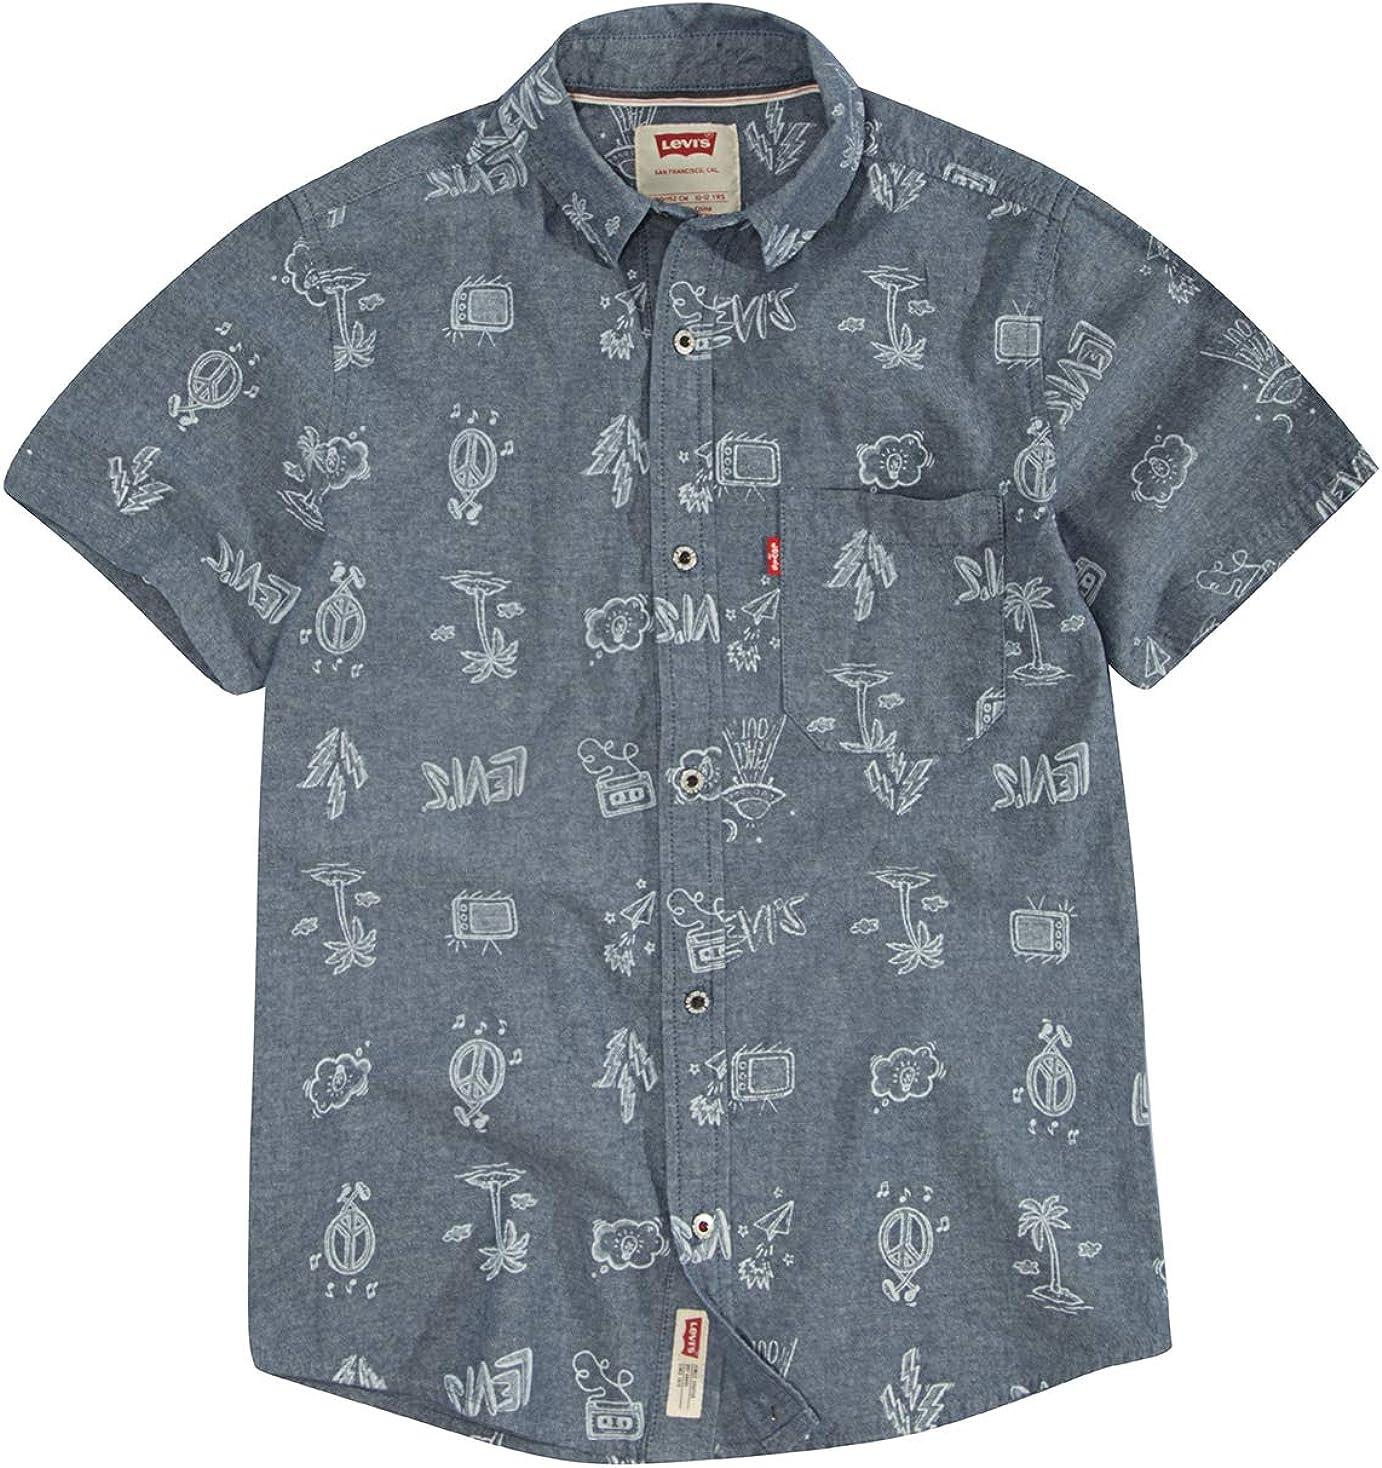 Levi's Boys' Short Sleeve Button Up Shirt